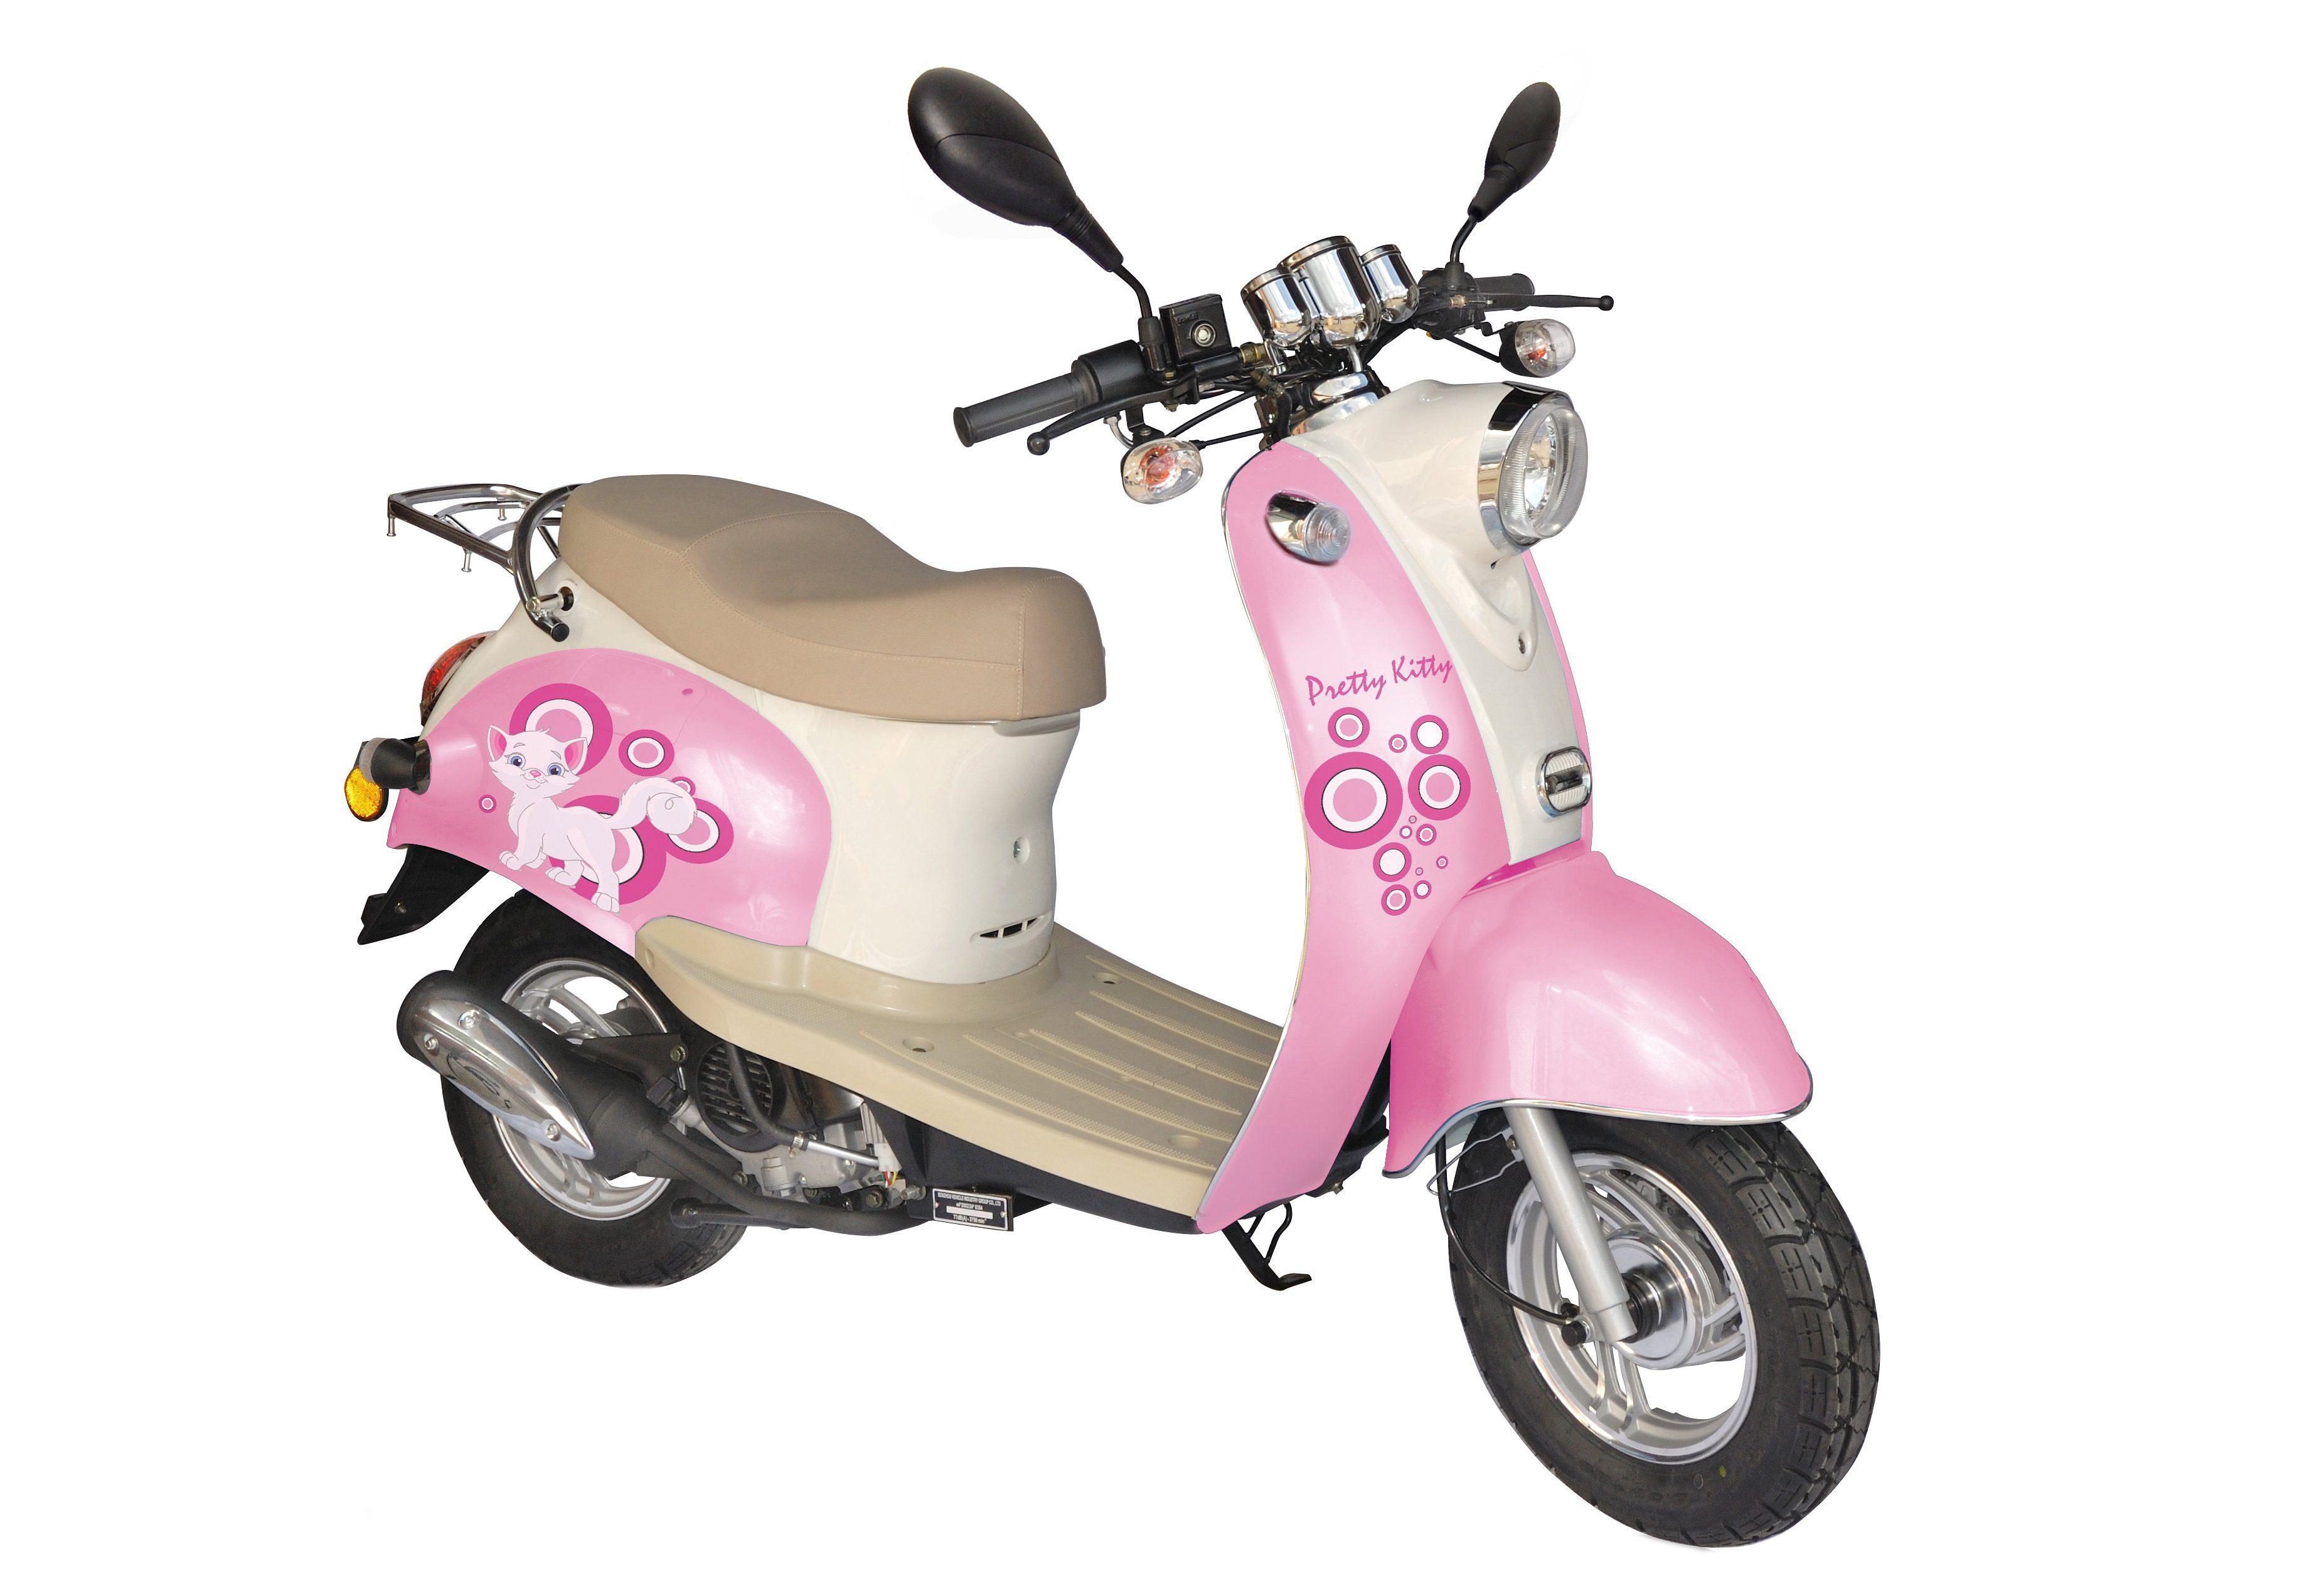 Retro-Mofaroller, Nova Motors, »Venezia II«, Pretty Kitty, 50 ccm 25 km/h, rosa-weiß